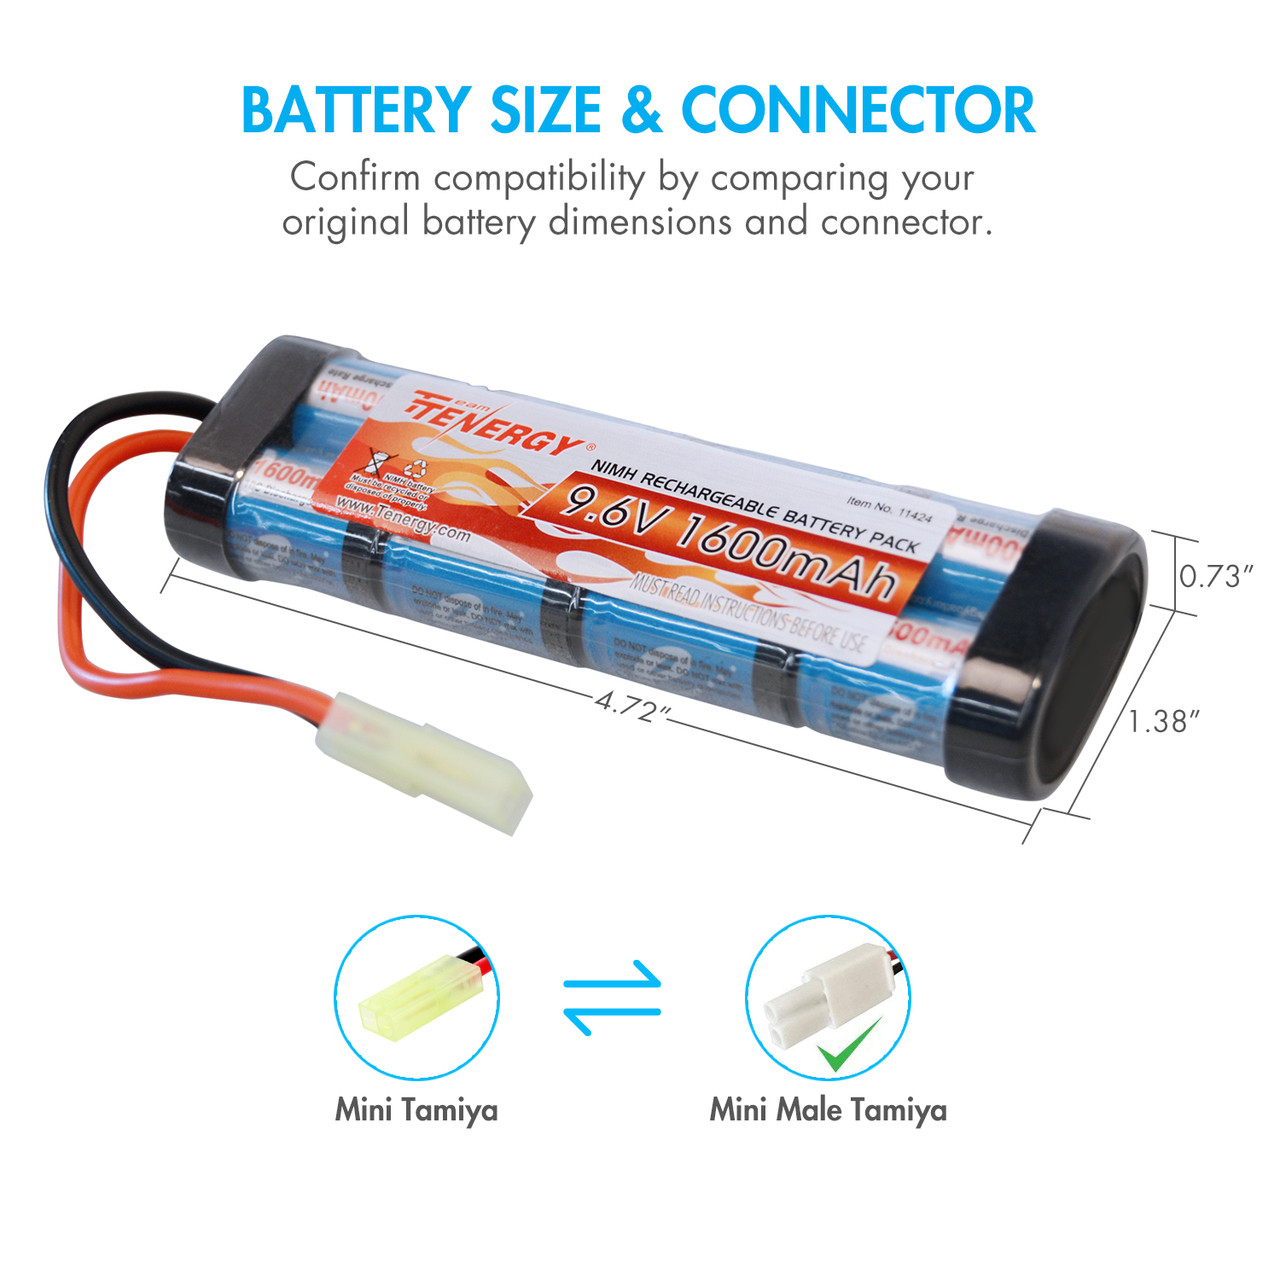 Combo: Tenergy Airsoft NiMH 9.6V 1600mAh Flat Battery Pack /w Mini Tamiya + Charger (#01026)